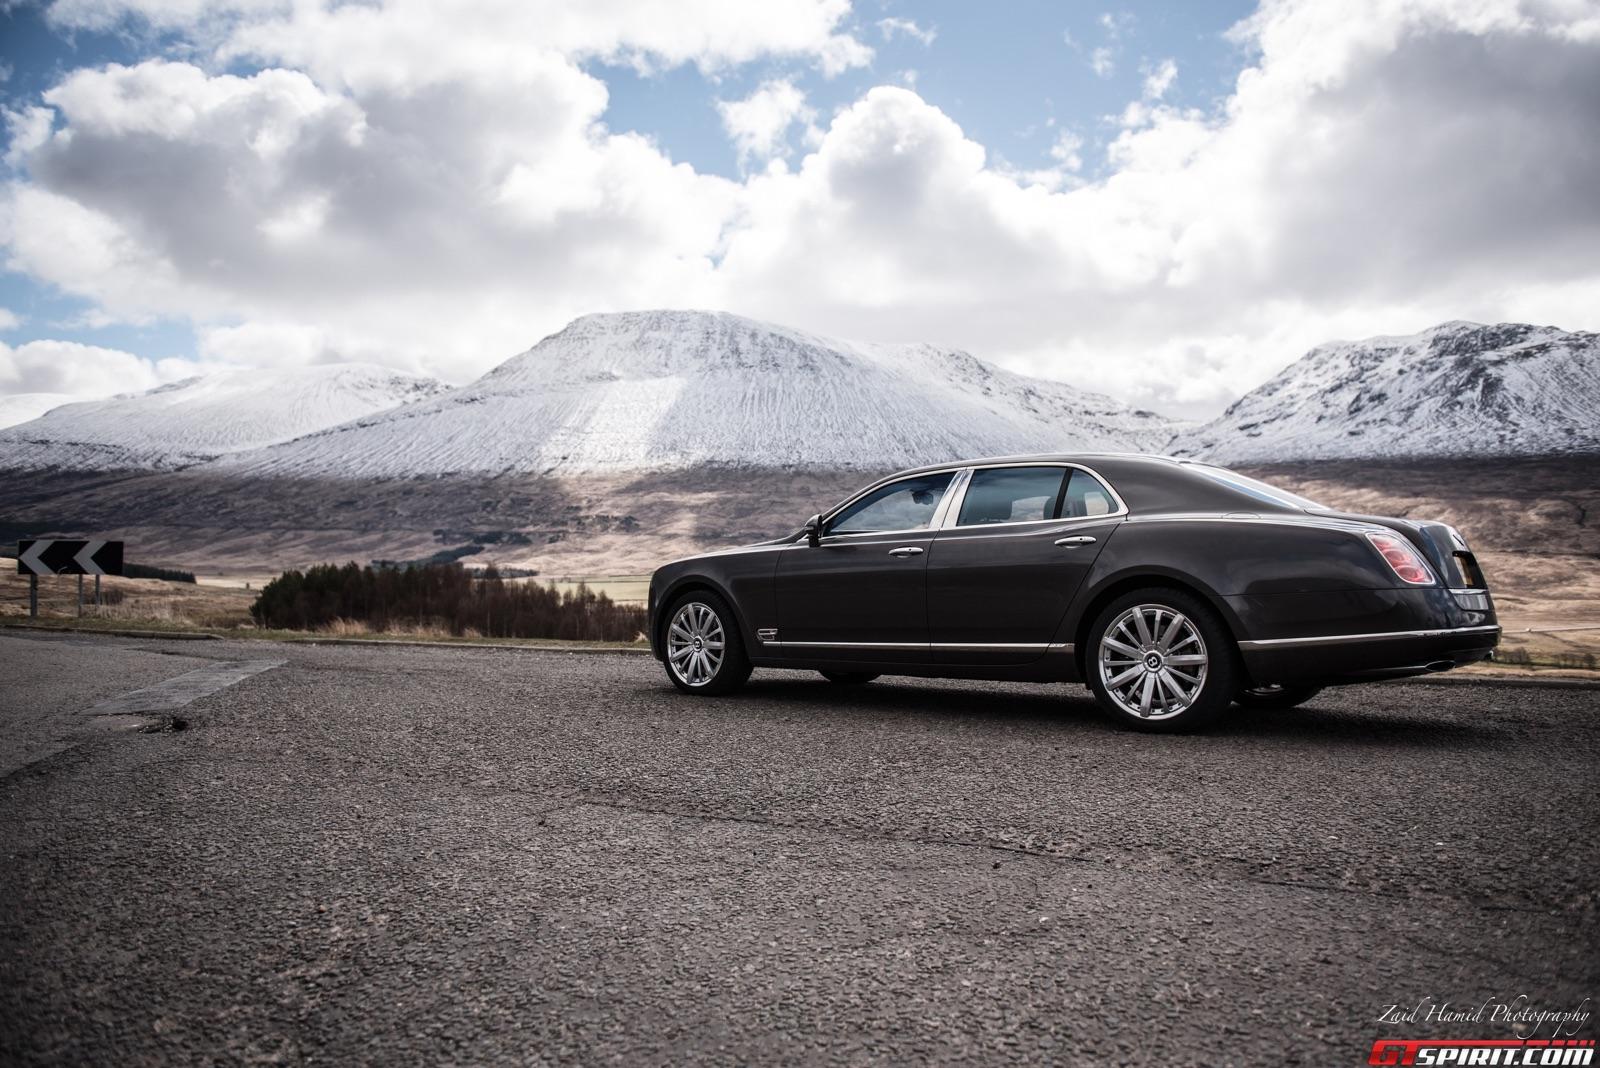 Bentley Mulsanne in the Highlands